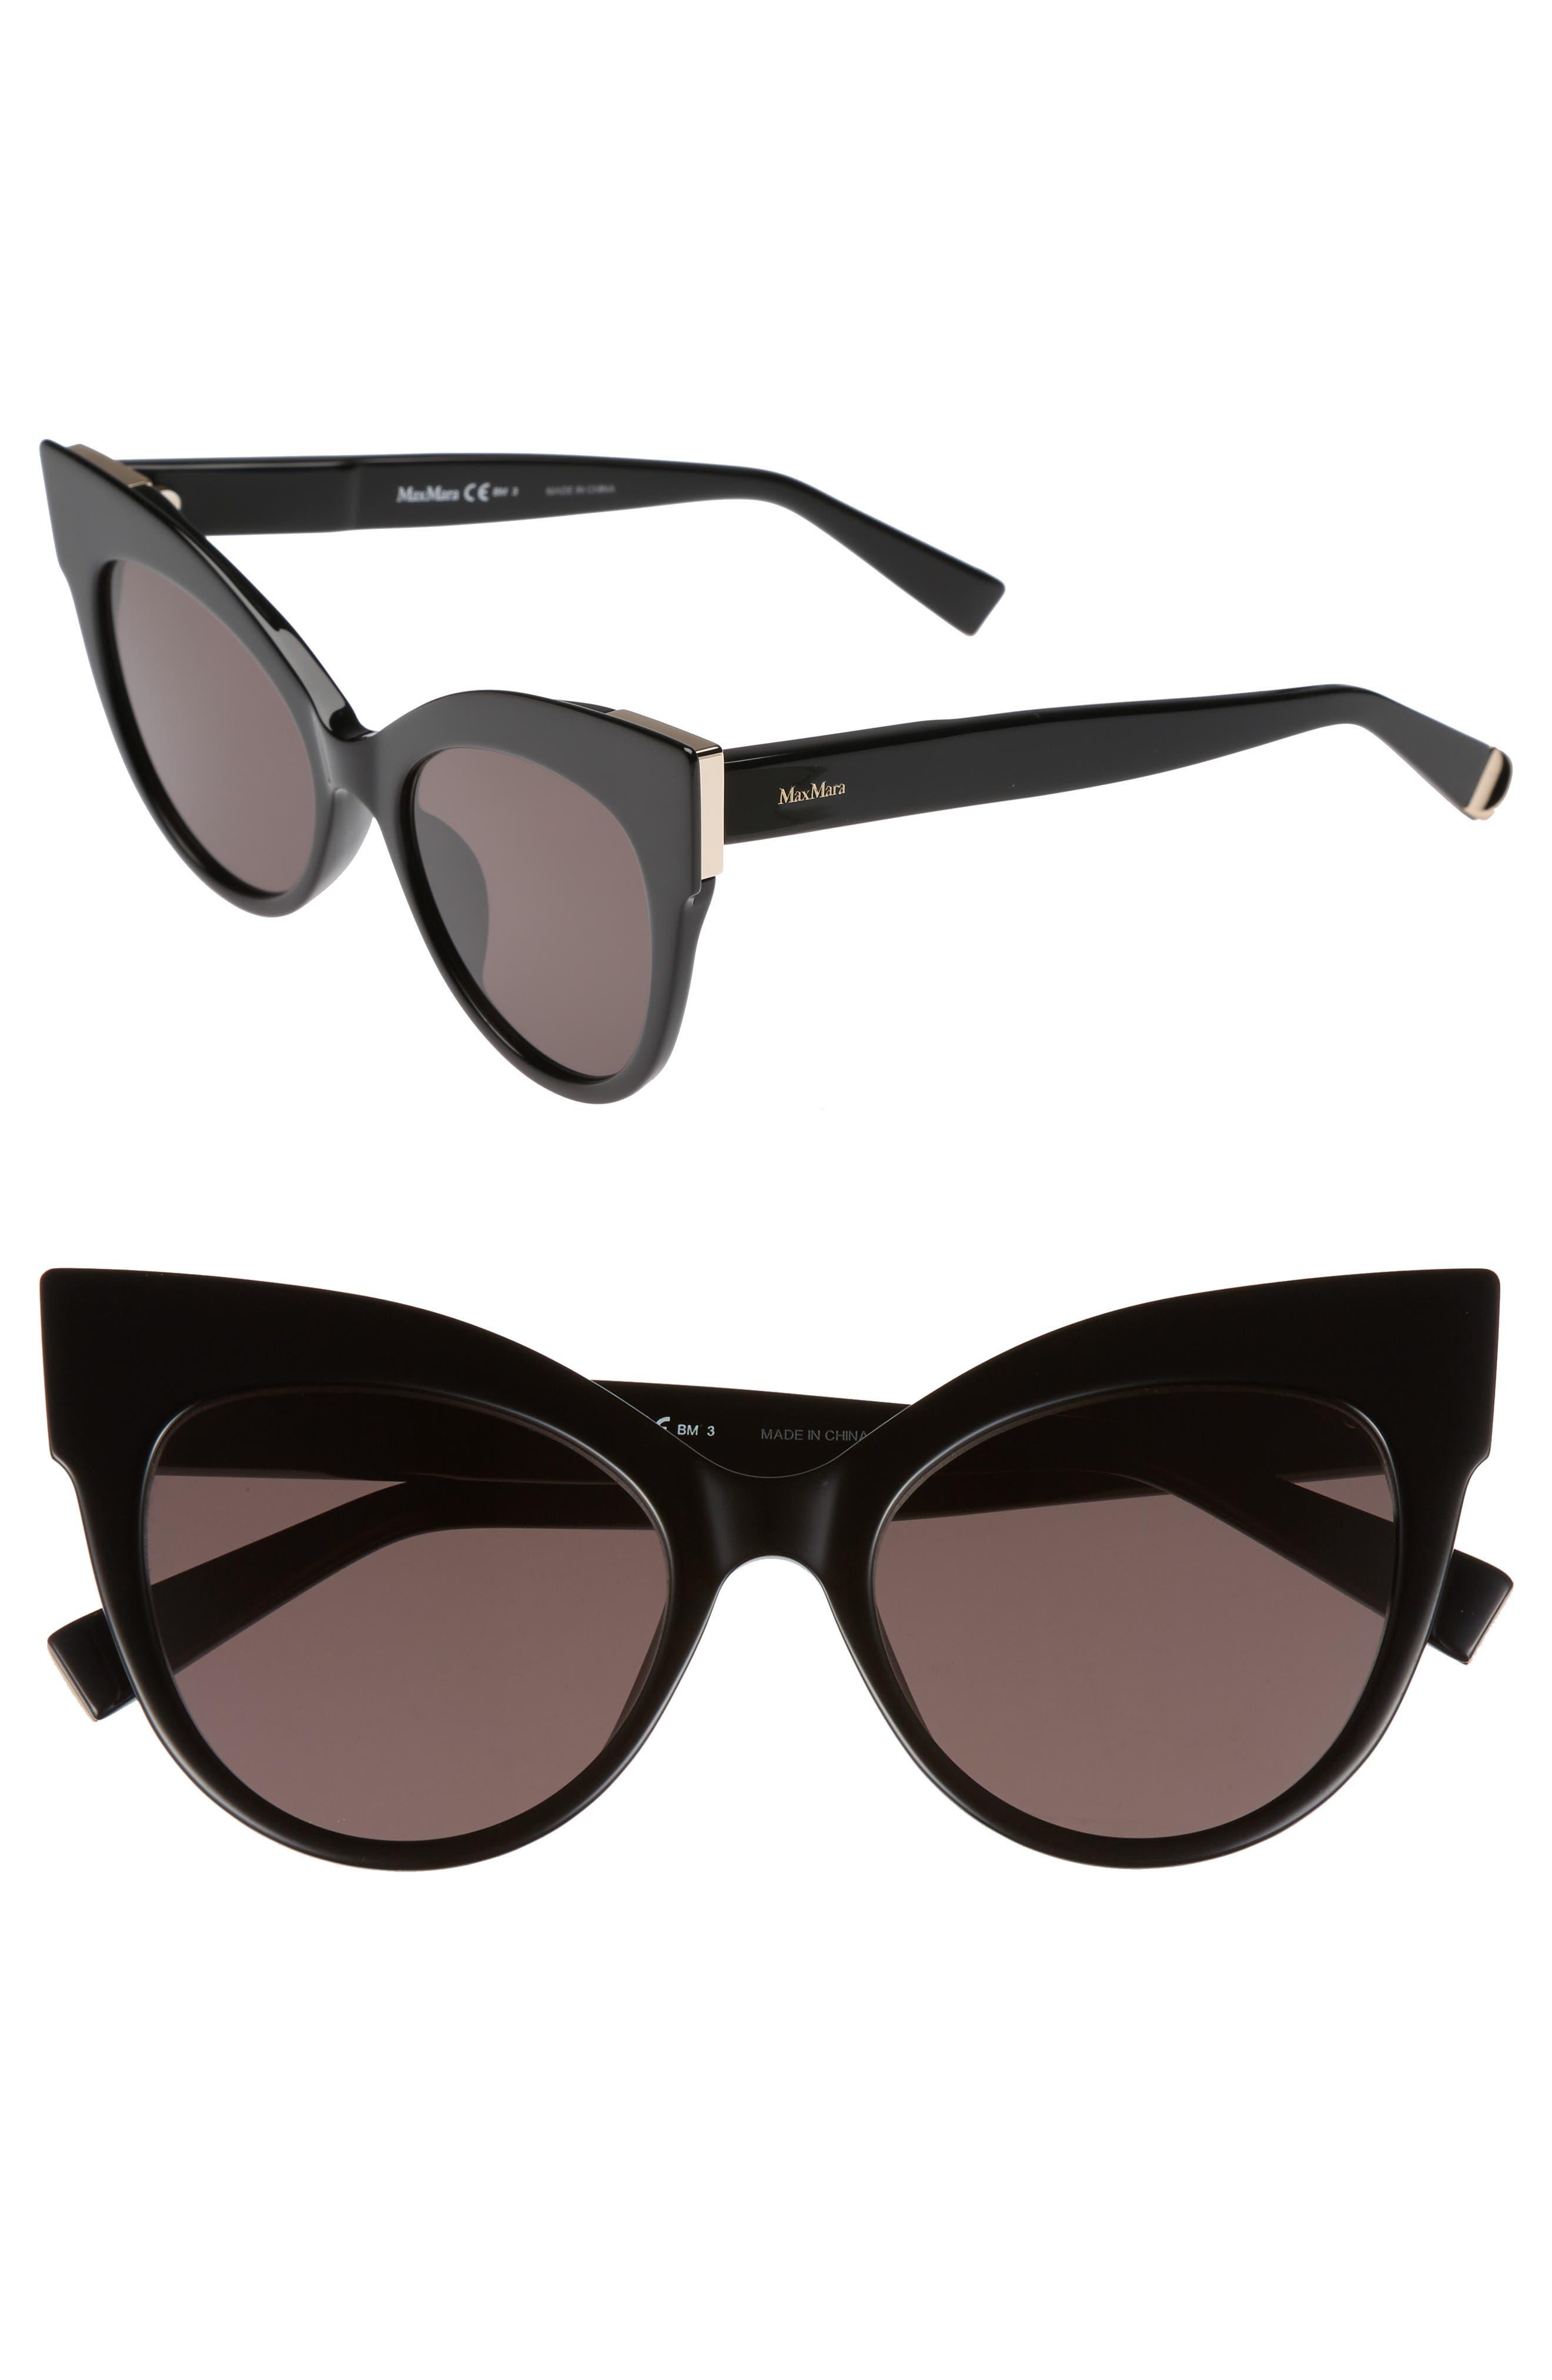 Anita 52mm Cat Eye Sunglasses,                             Main thumbnail 1, color,                             001